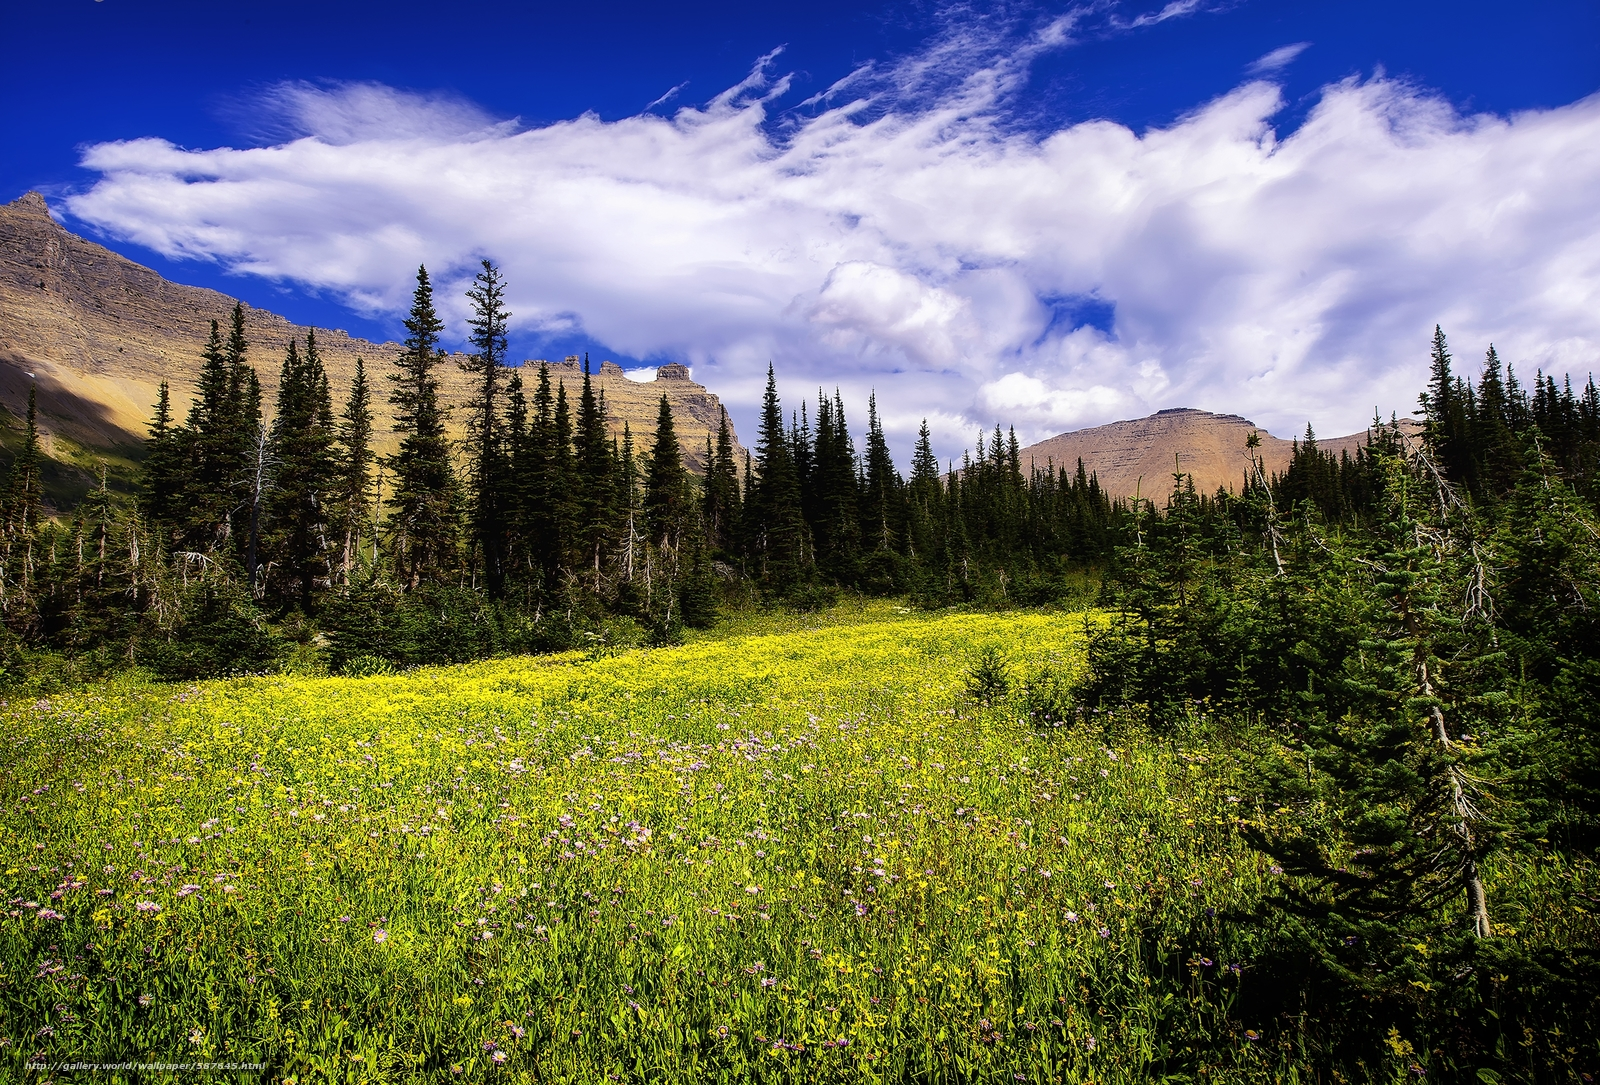 download wallpaper glacier national park montana